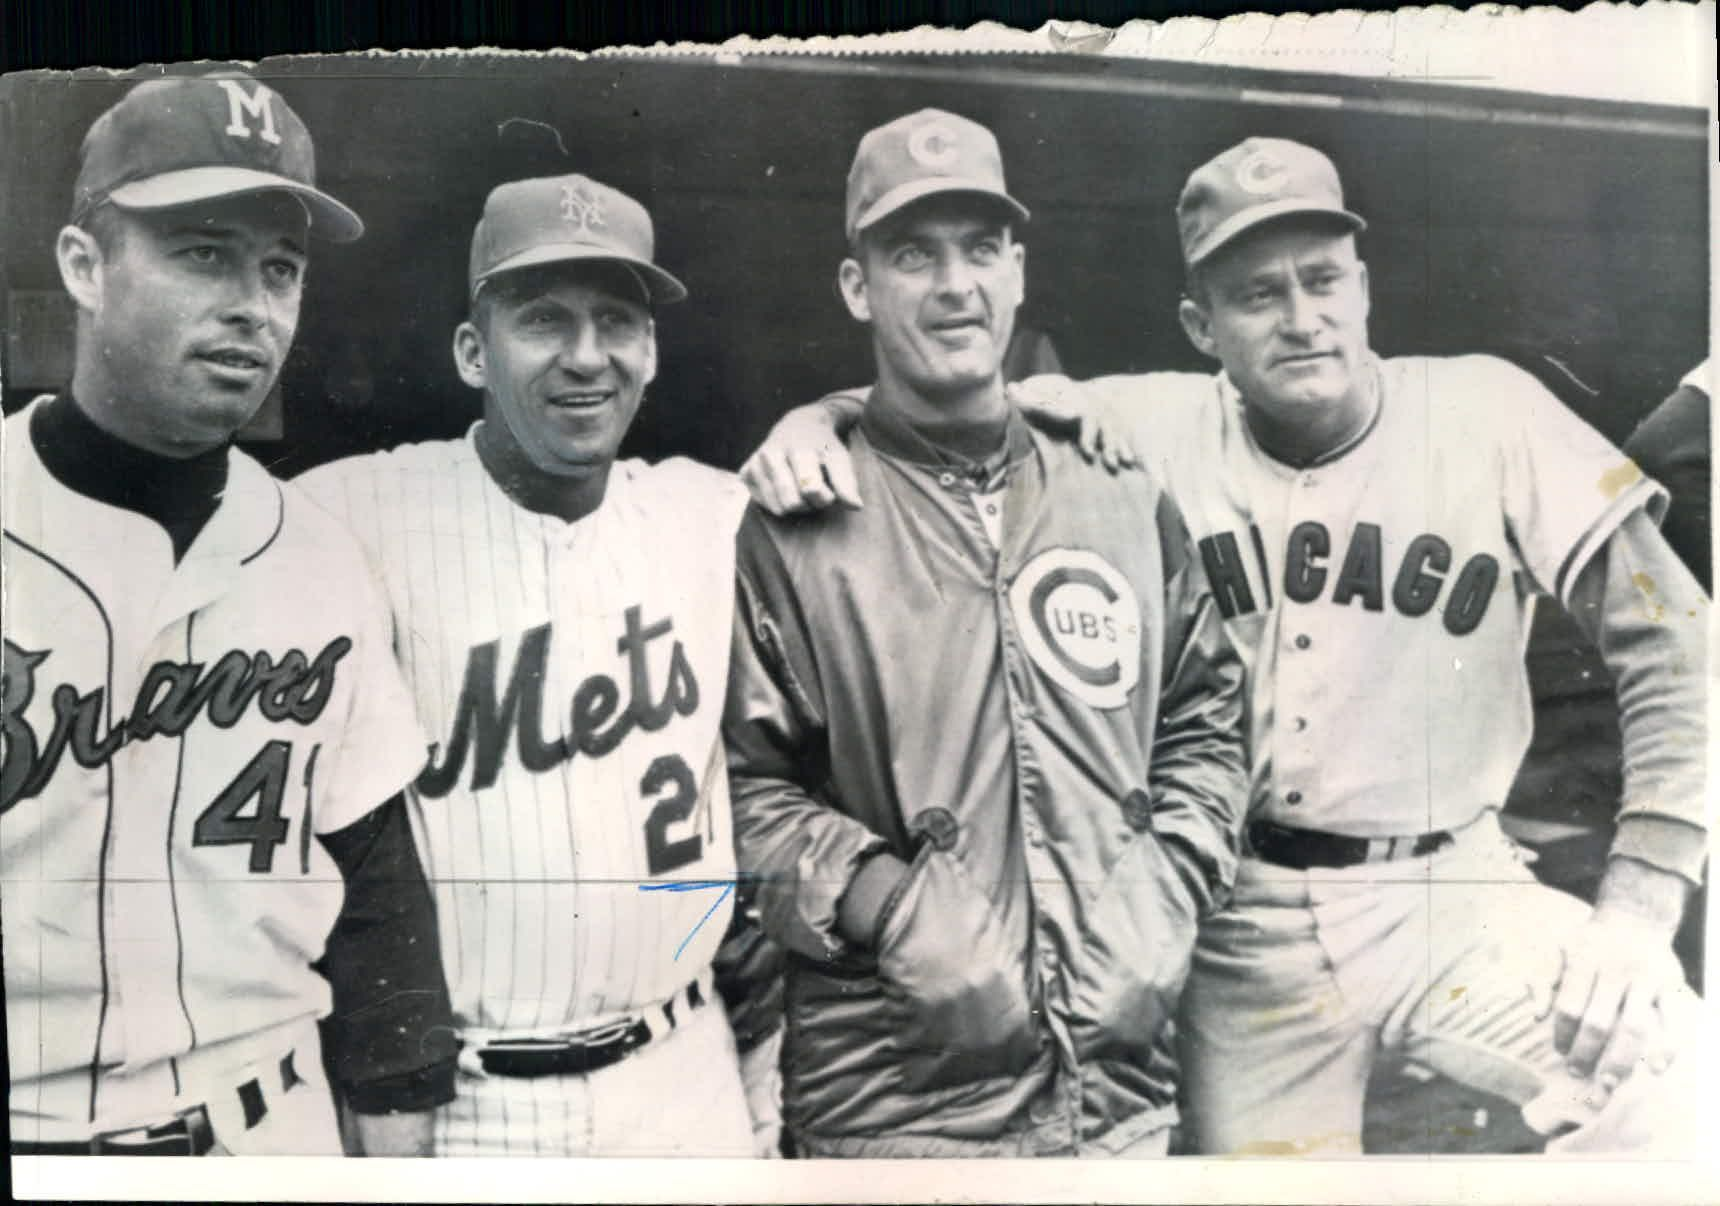 A Poignant 1965 Photo Milwaukee Braves Third Baseman Eddie Mathews With Former 1950s Braves Teammates Warren Mlb Uniforms Baseball History Baseball Posters